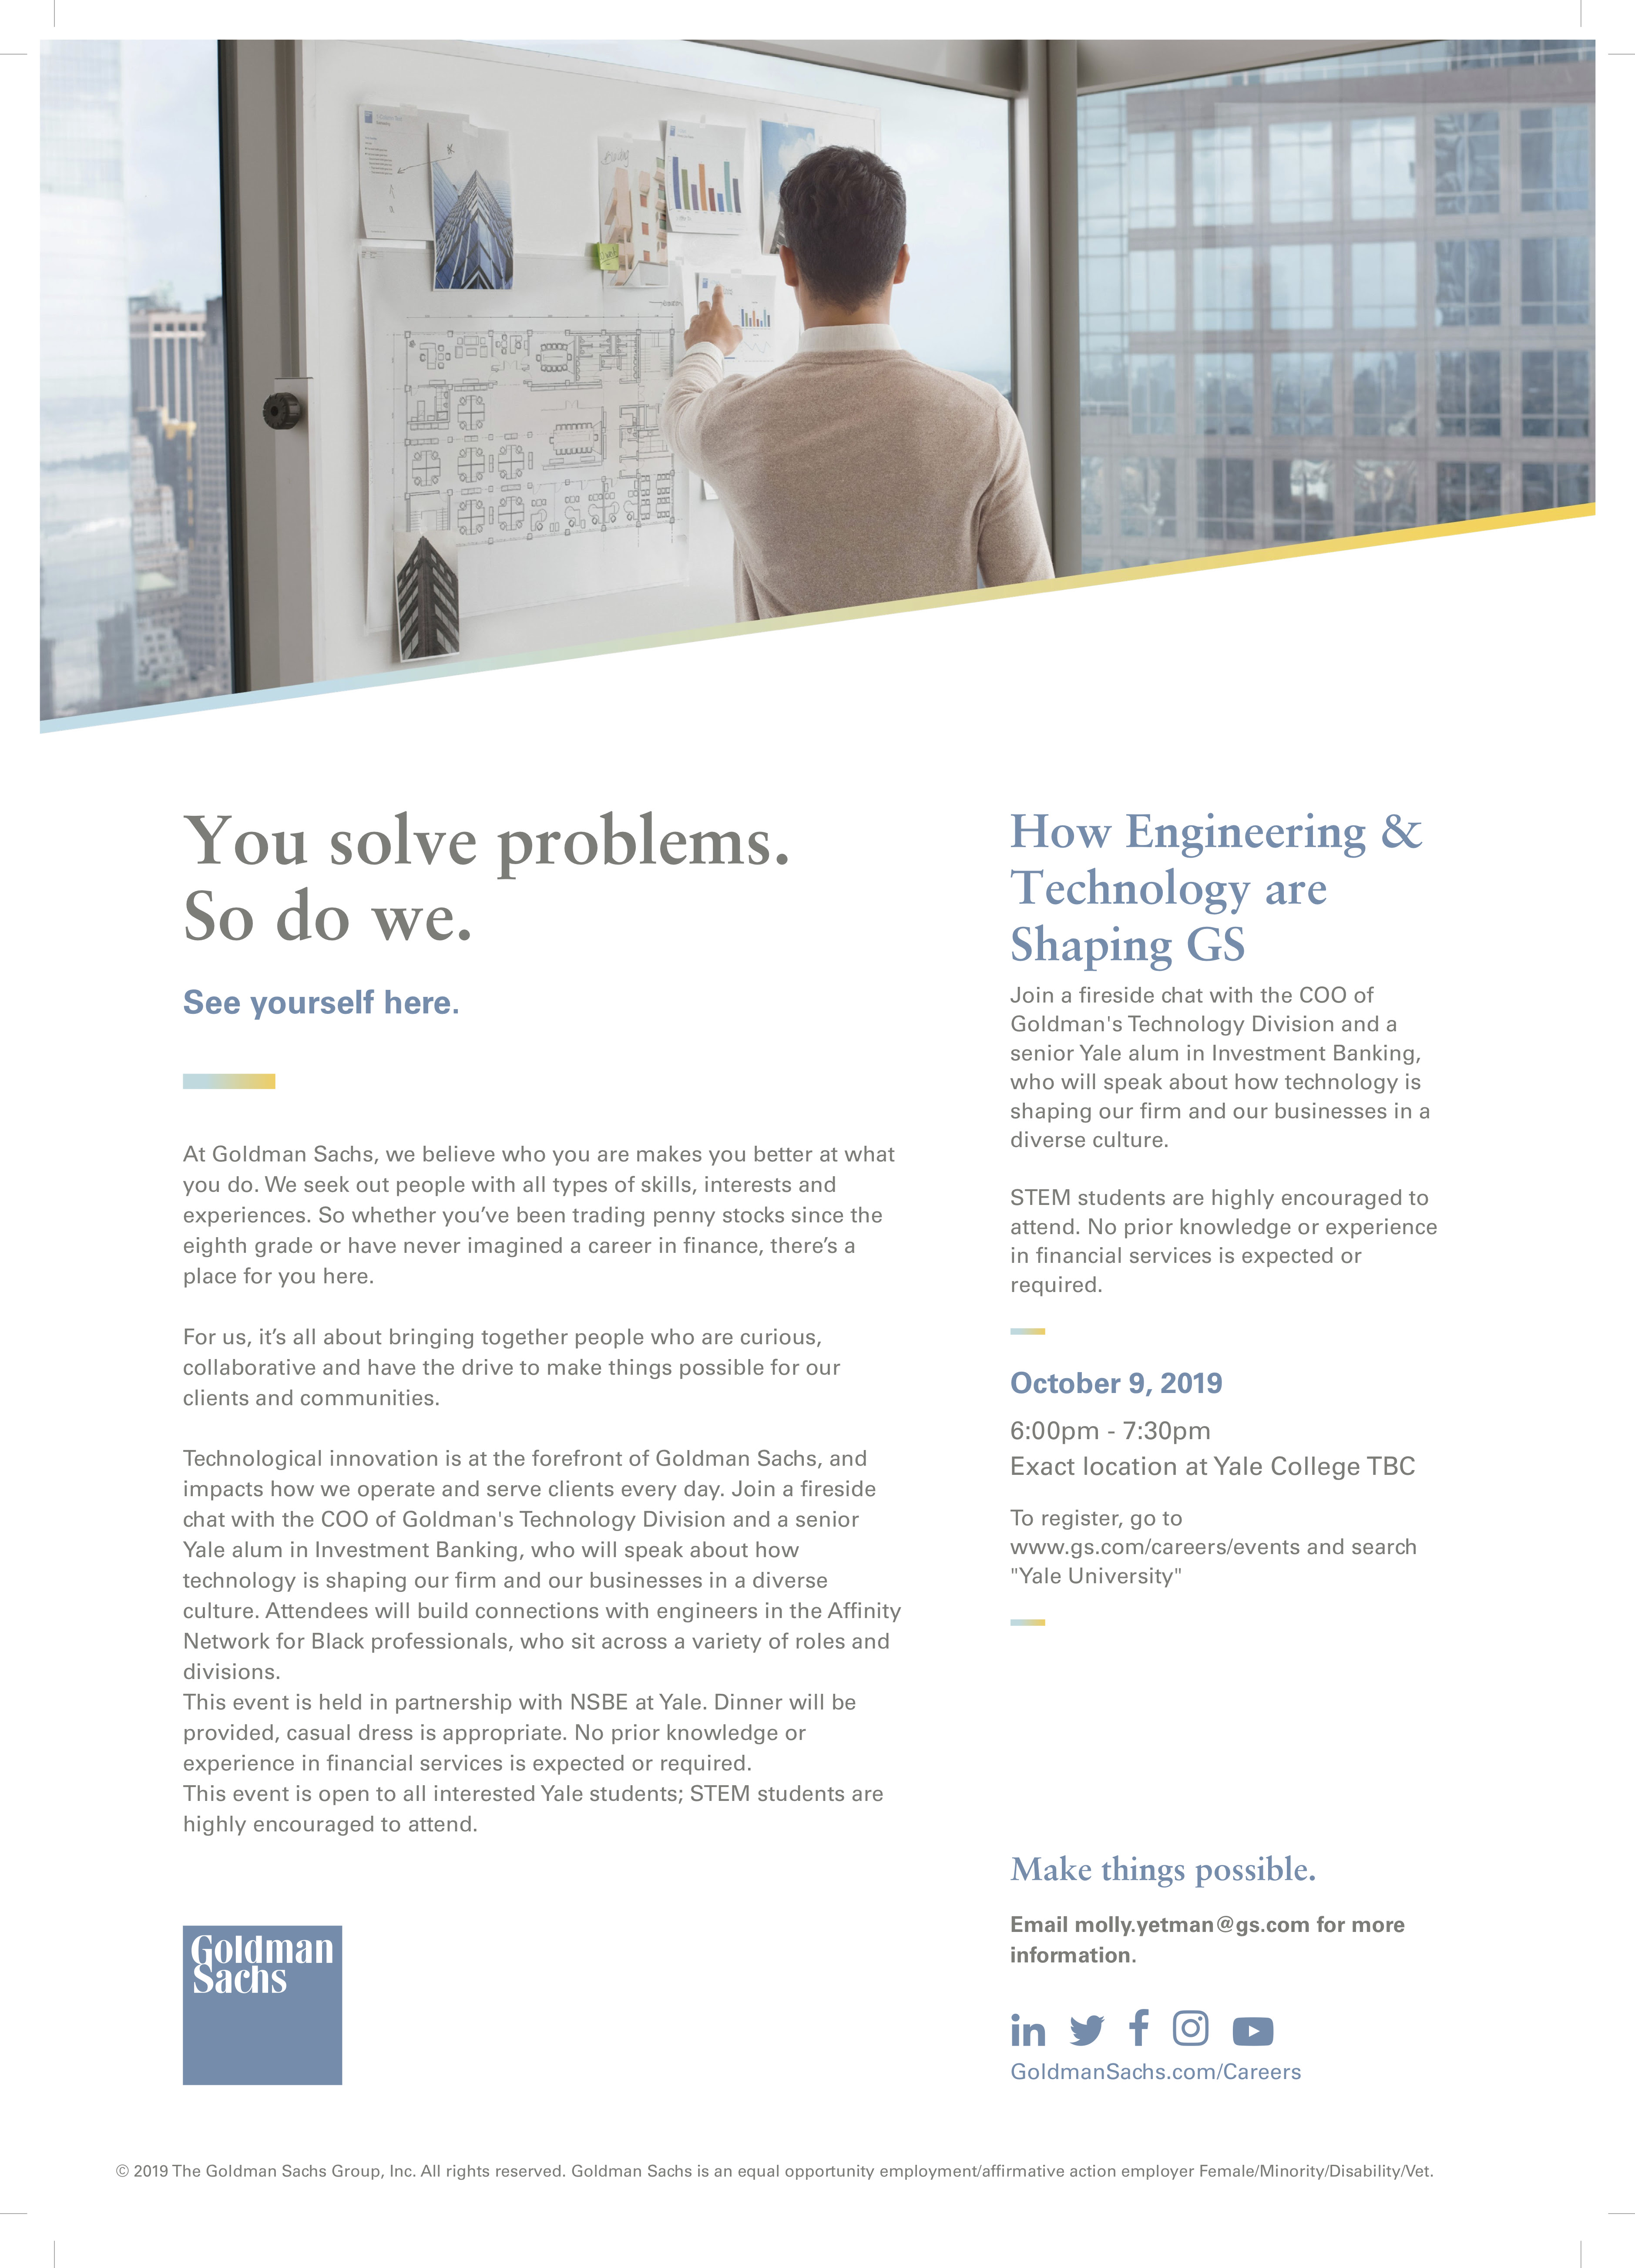 Goldman Sachs Opportunity